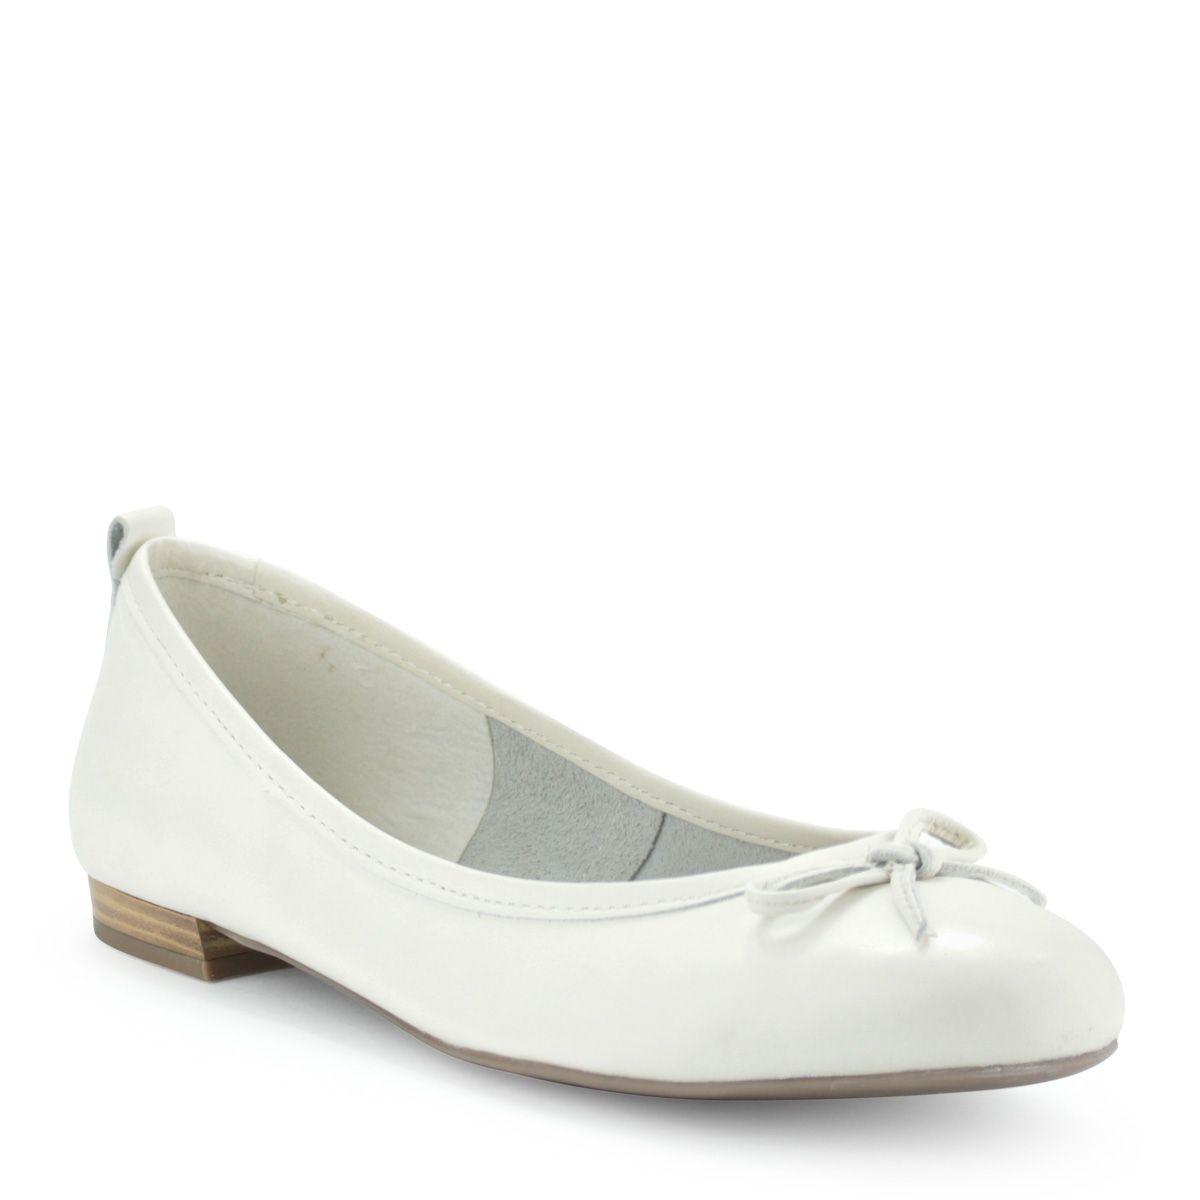 Fehér Tamaris balerina cipő masni dísszel  e72b36cde9